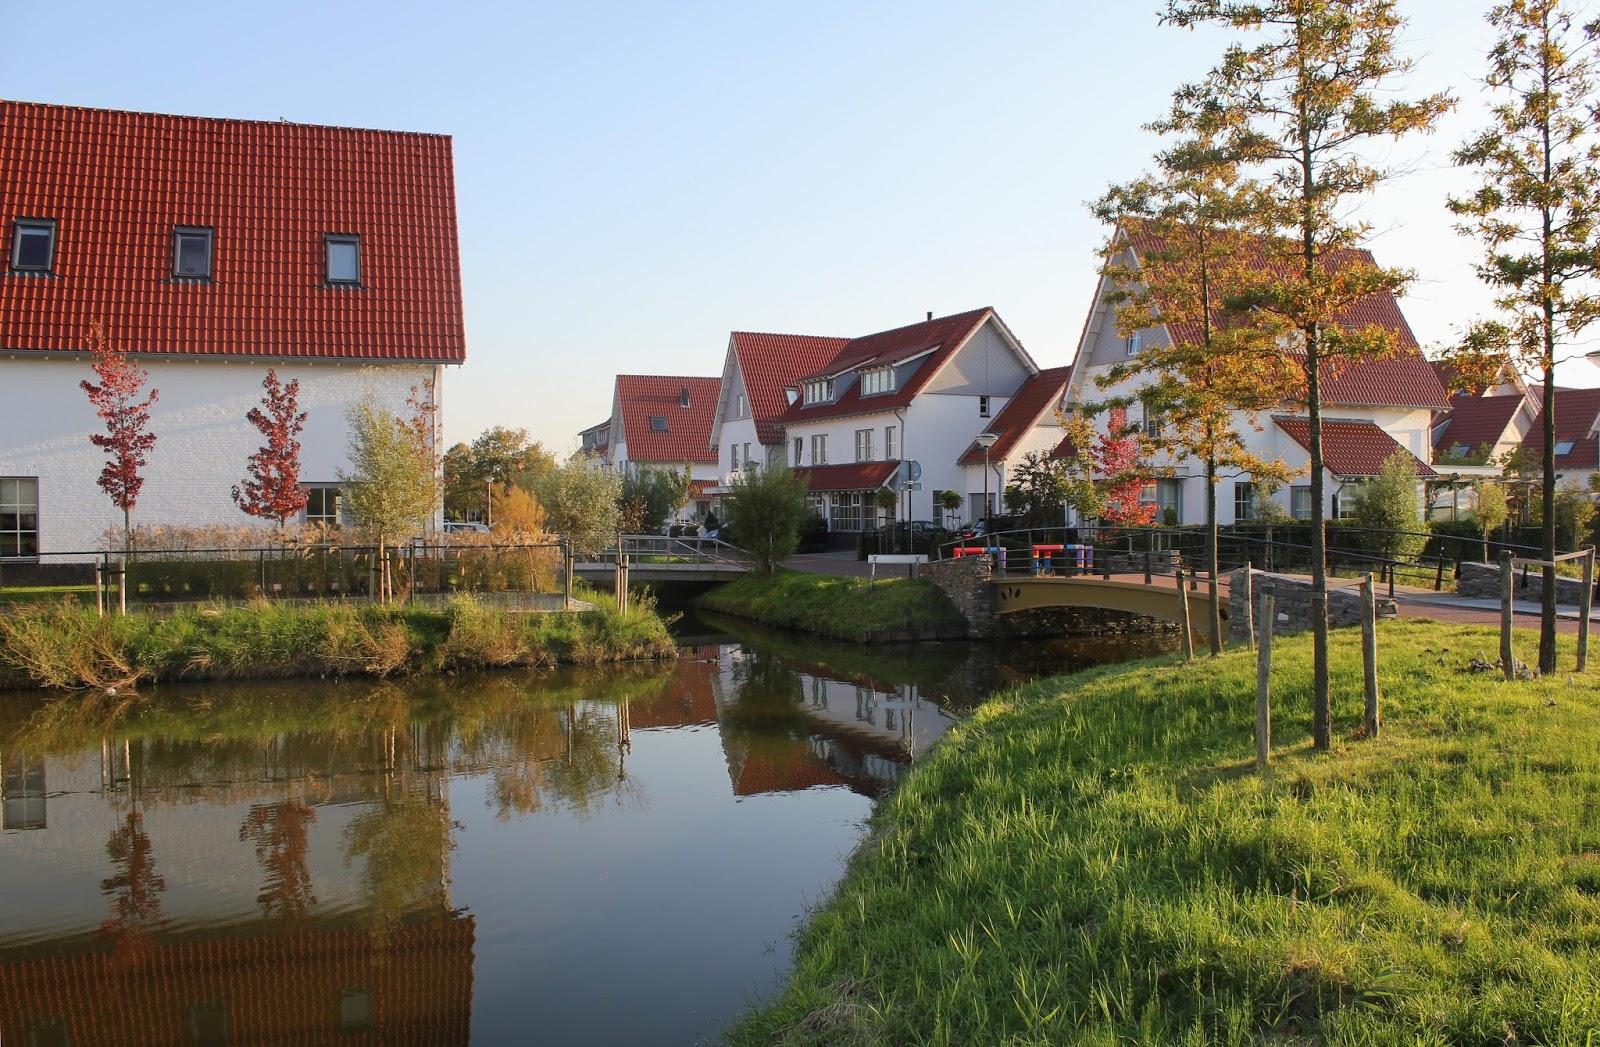 Peter Foolen Stads Natuur Maken Making Urban Nature